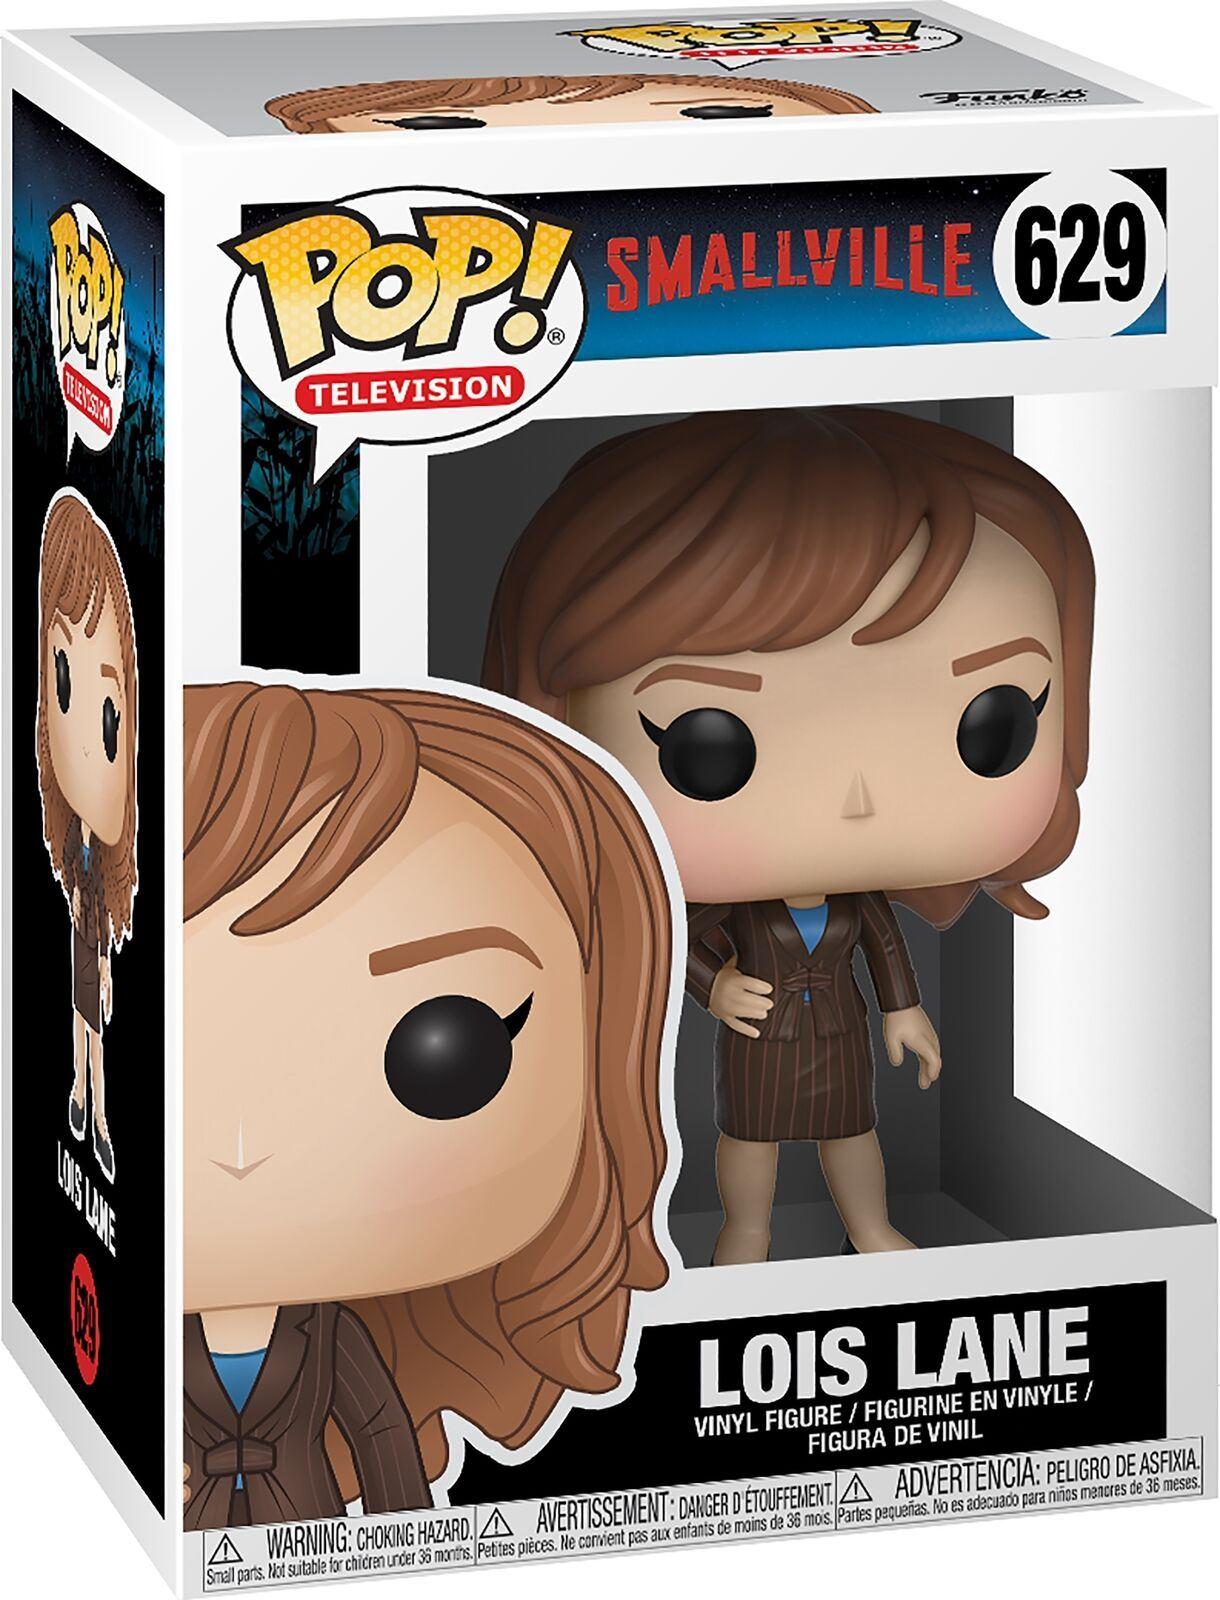 Funko POP Vinyl Smallville Lois Lane #629 Collectable Figure